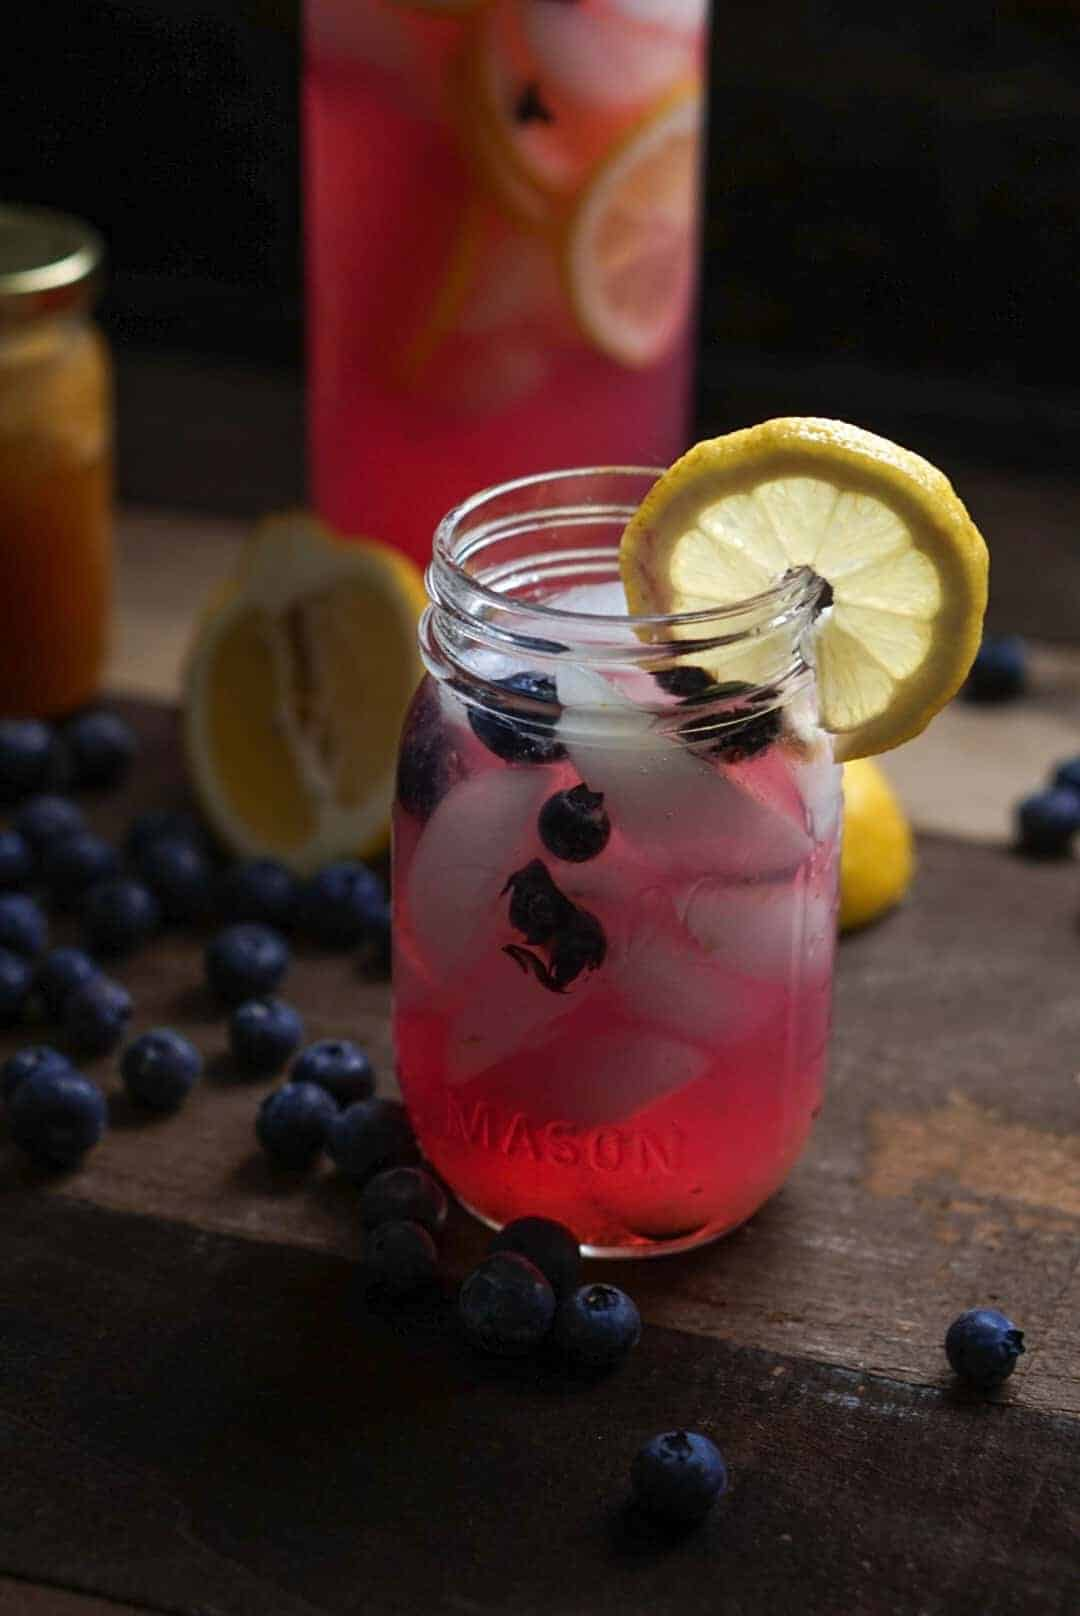 up-close glass of pink blueberry lemonade